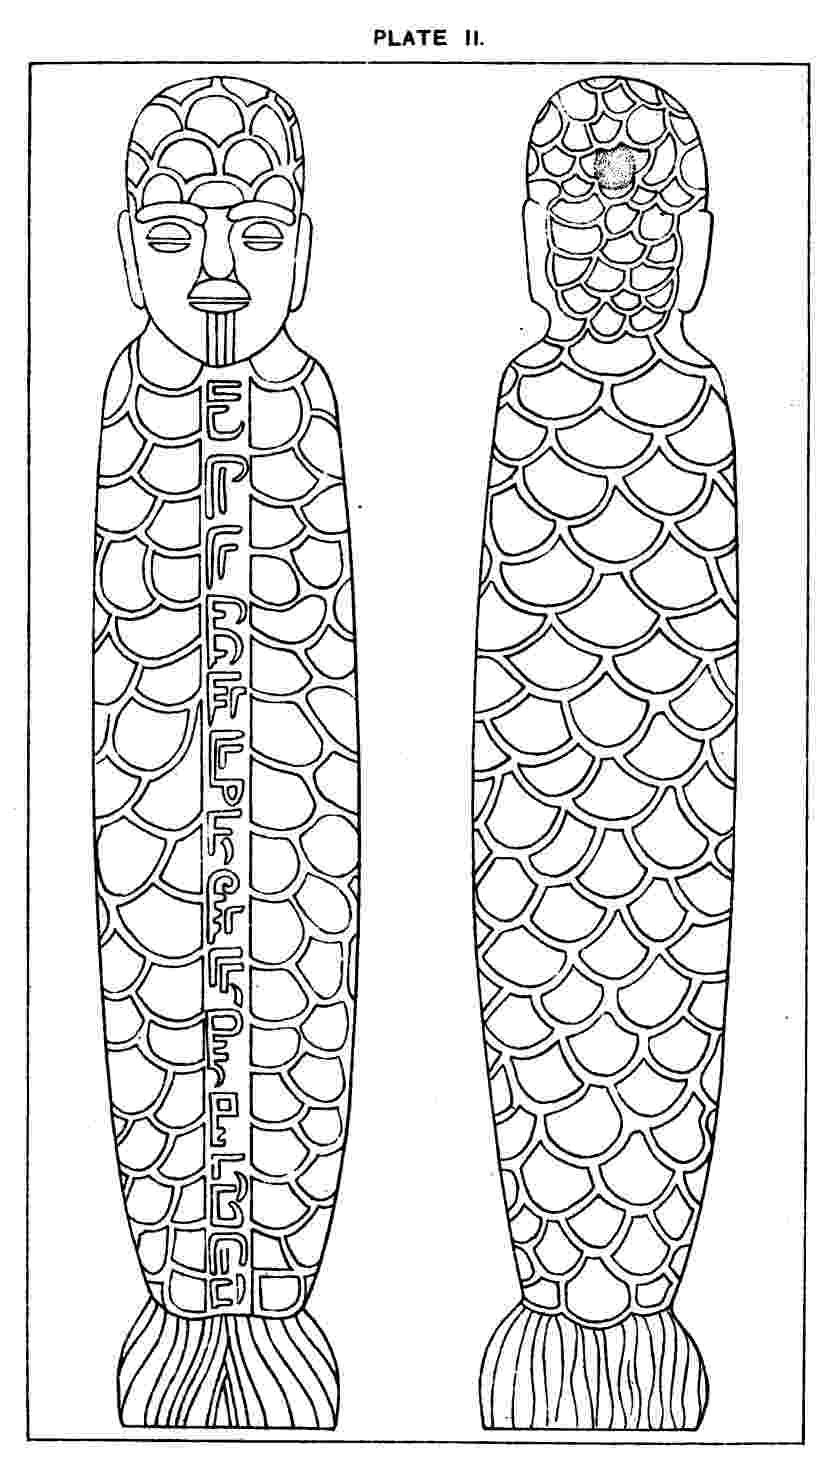 Ancient pagan and modern christian symbolism by thomas inman md plate ii 054 biocorpaavc Choice Image